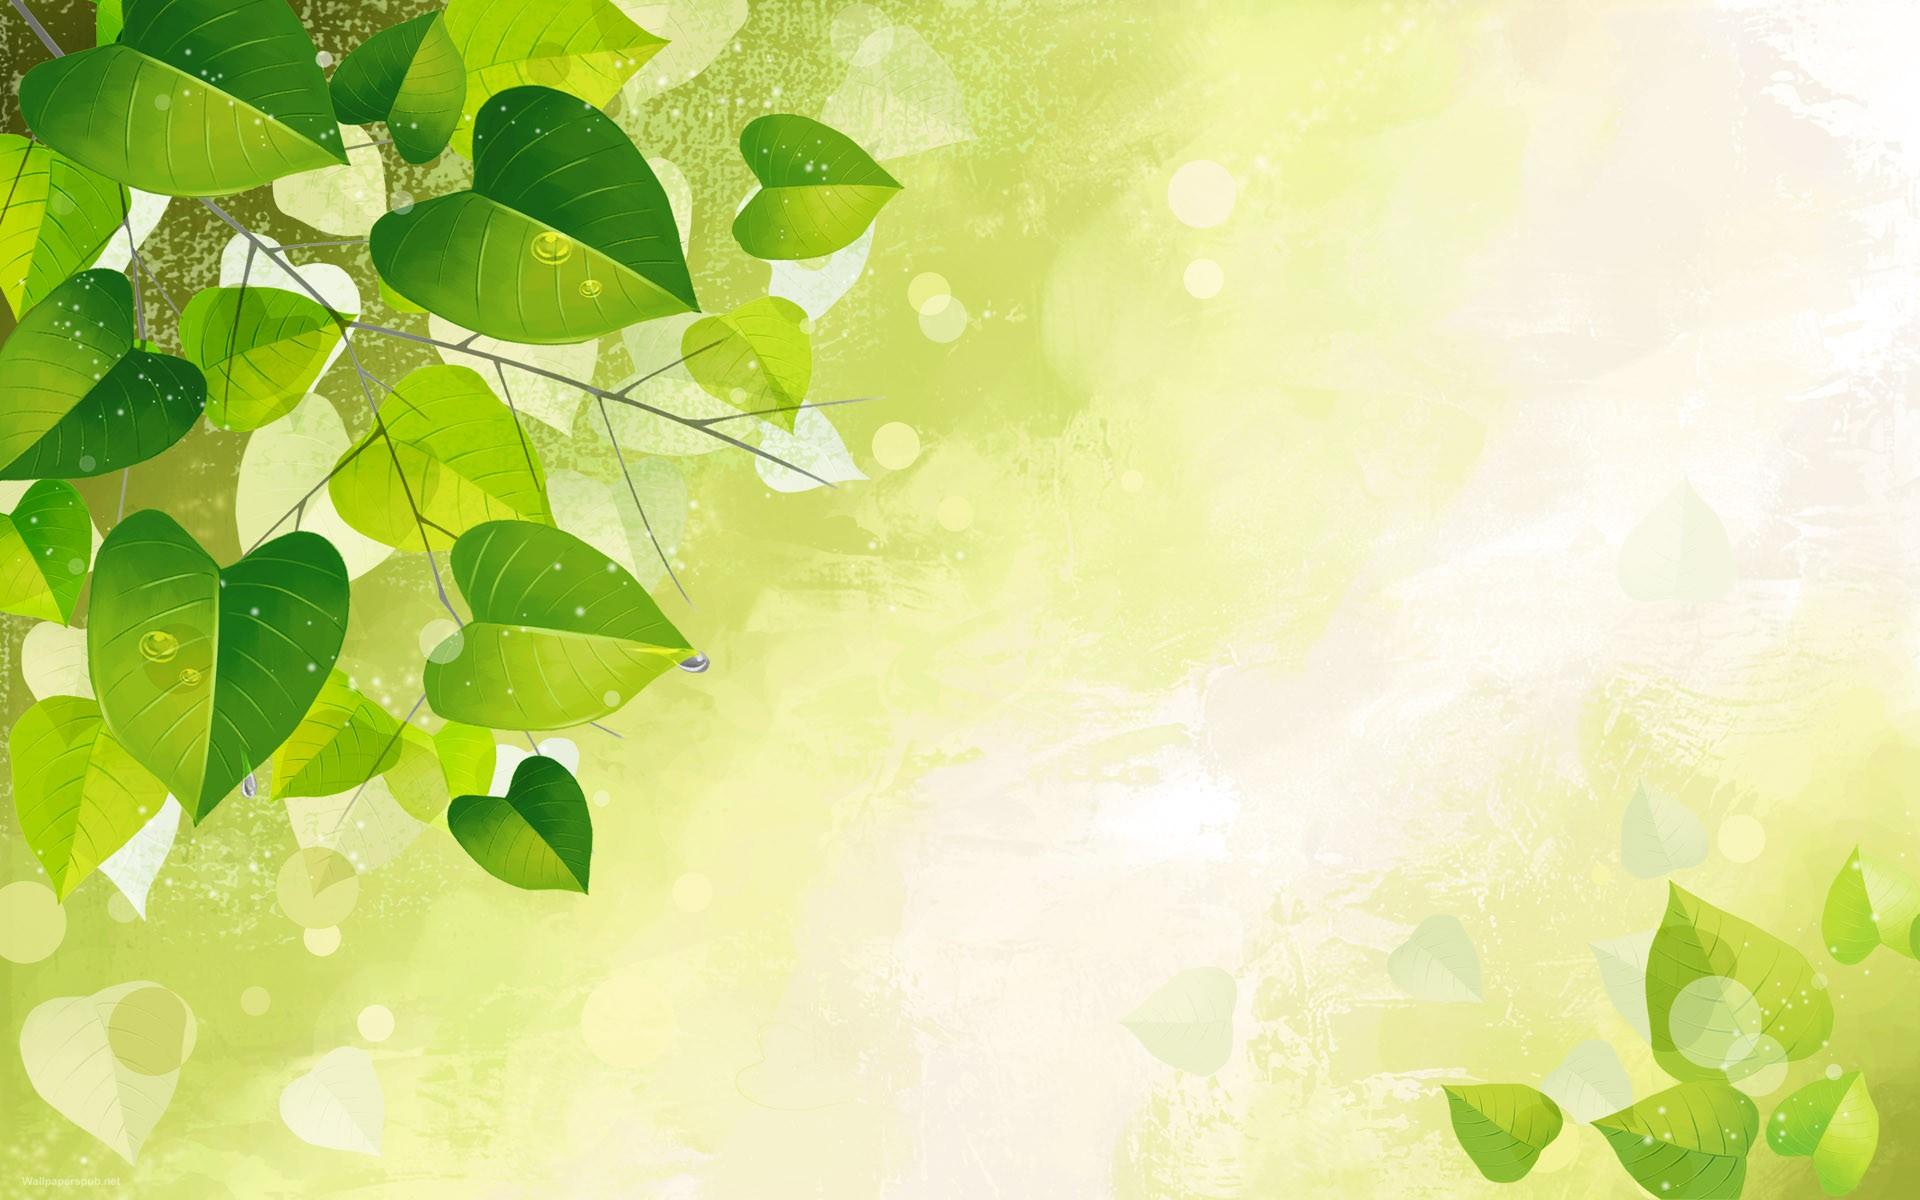 Art Leaf Wallpaper HD wallpapers   Green Vector Art Leaf Wallpaper 1920x1200